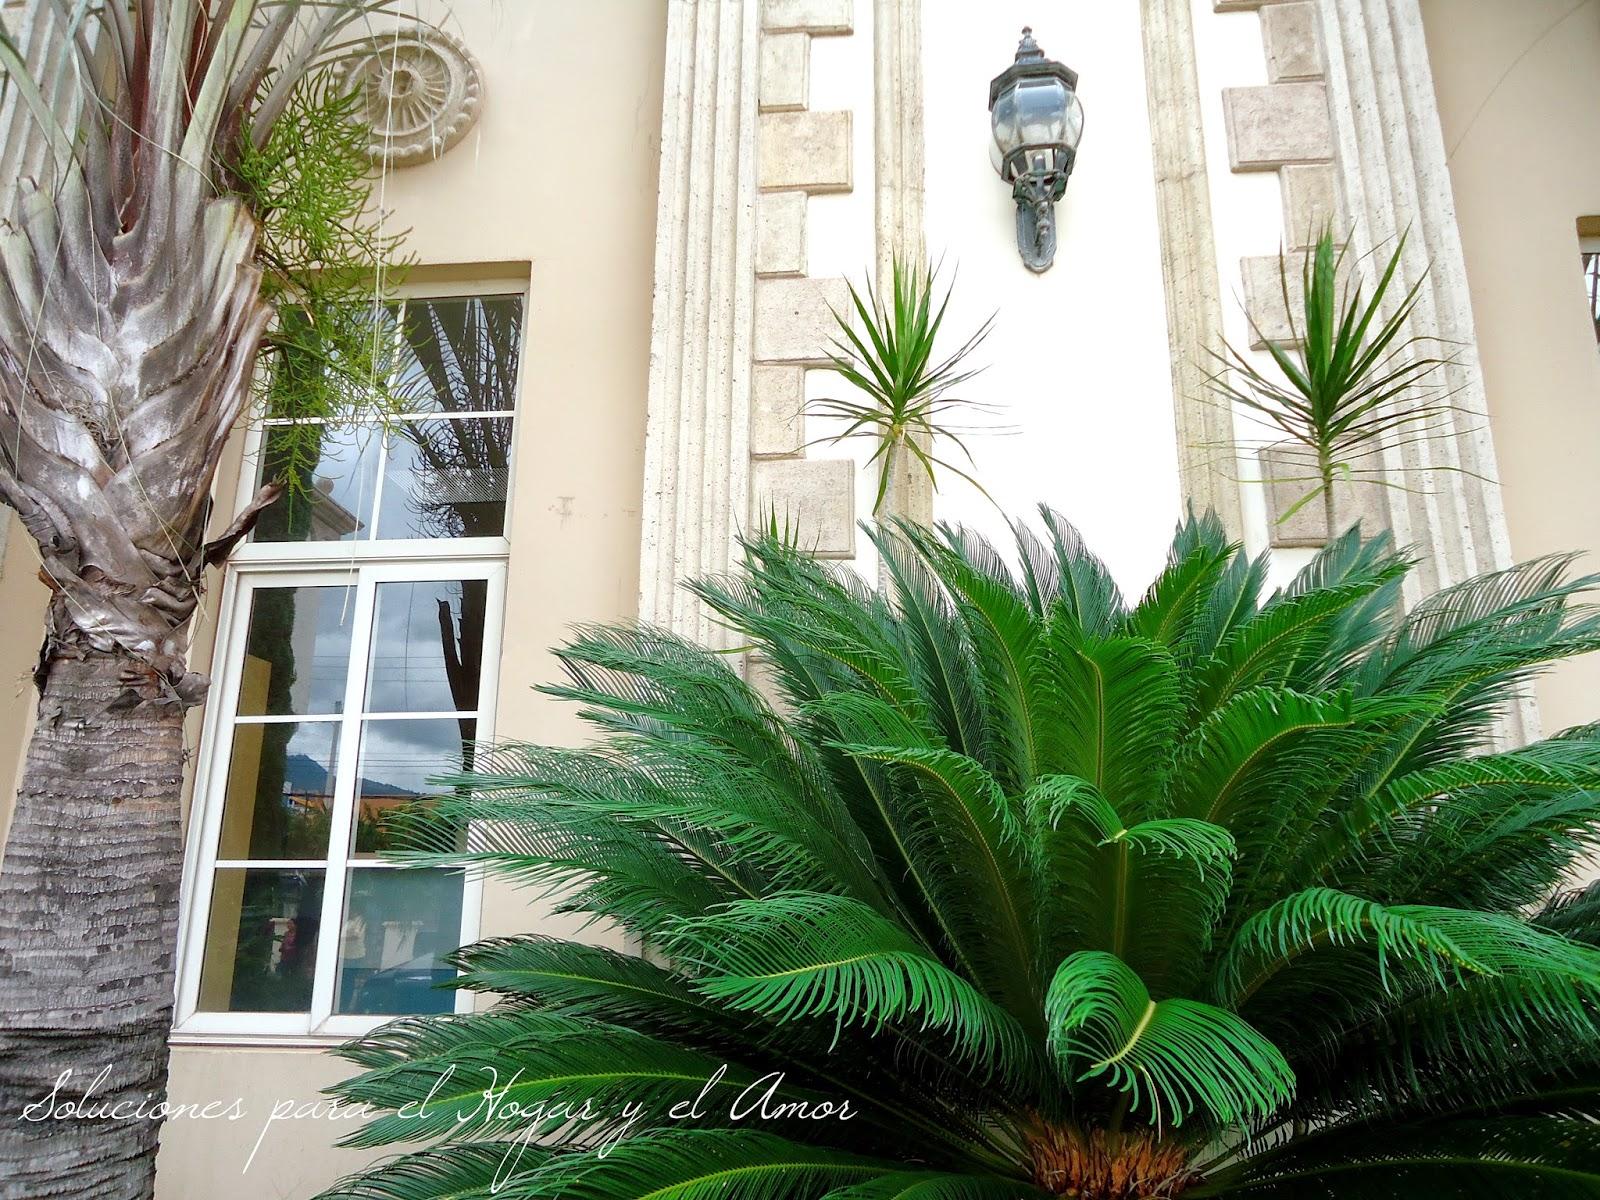 plantas, jardín, ventana,